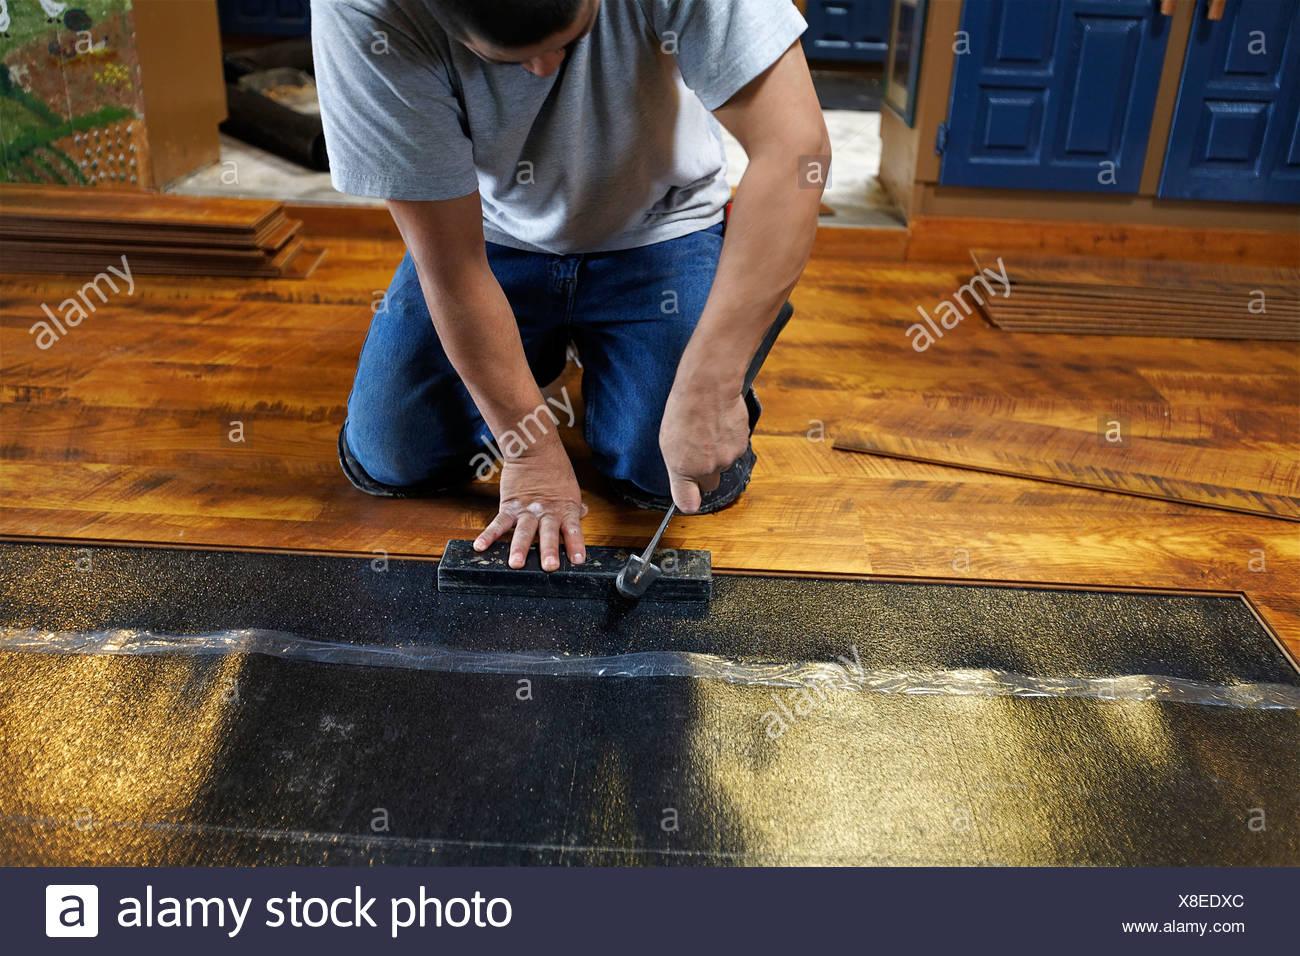 Verlegung Neuer Laminatboden Bodenbelag Arbeiter Beschäftigten Mann Männer  Häuser Innen Drinnen Wohnung Stockbild